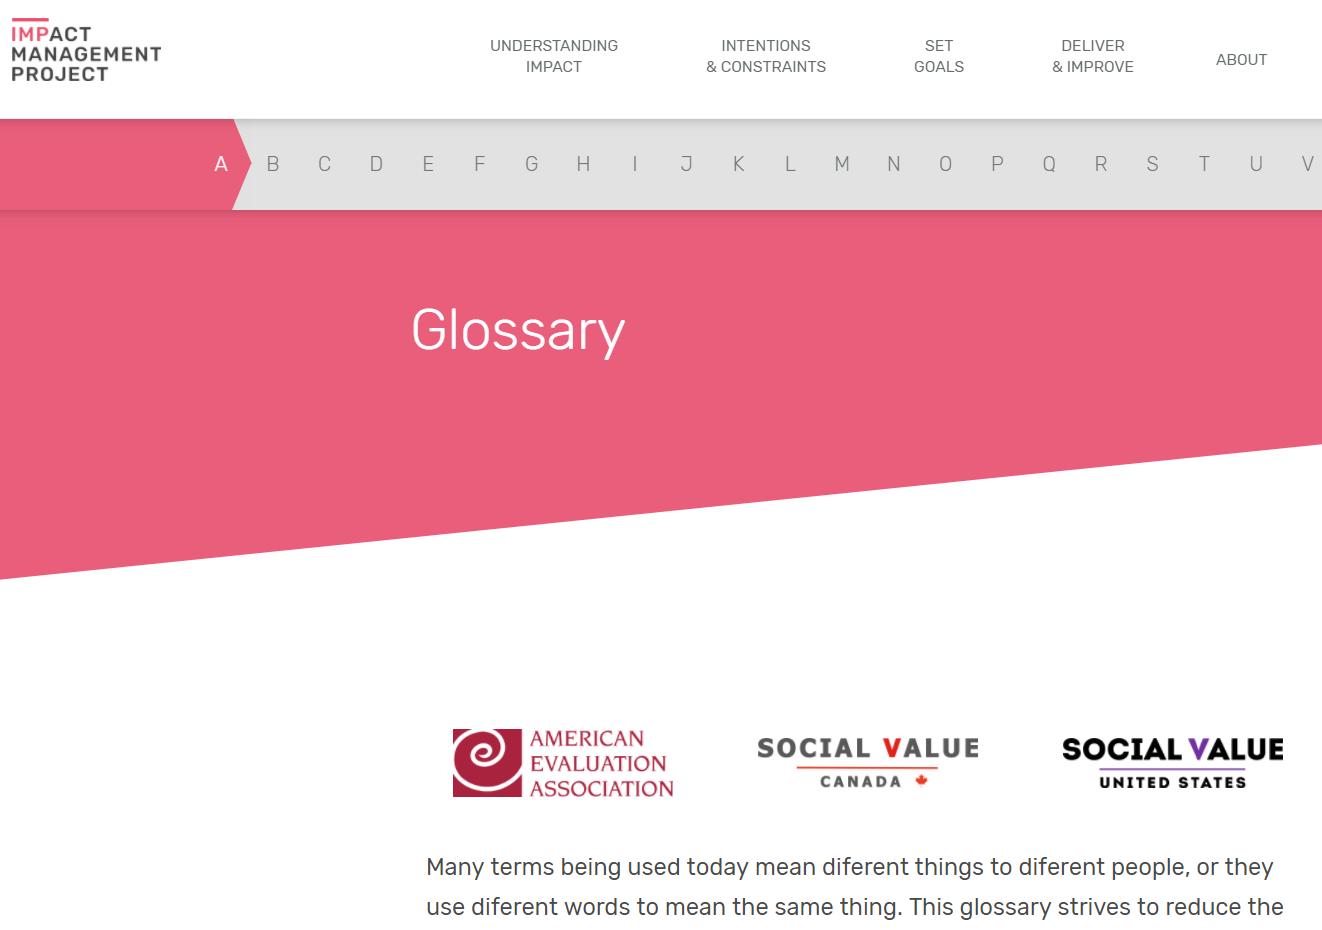 IMP Glossary Screenshot.png